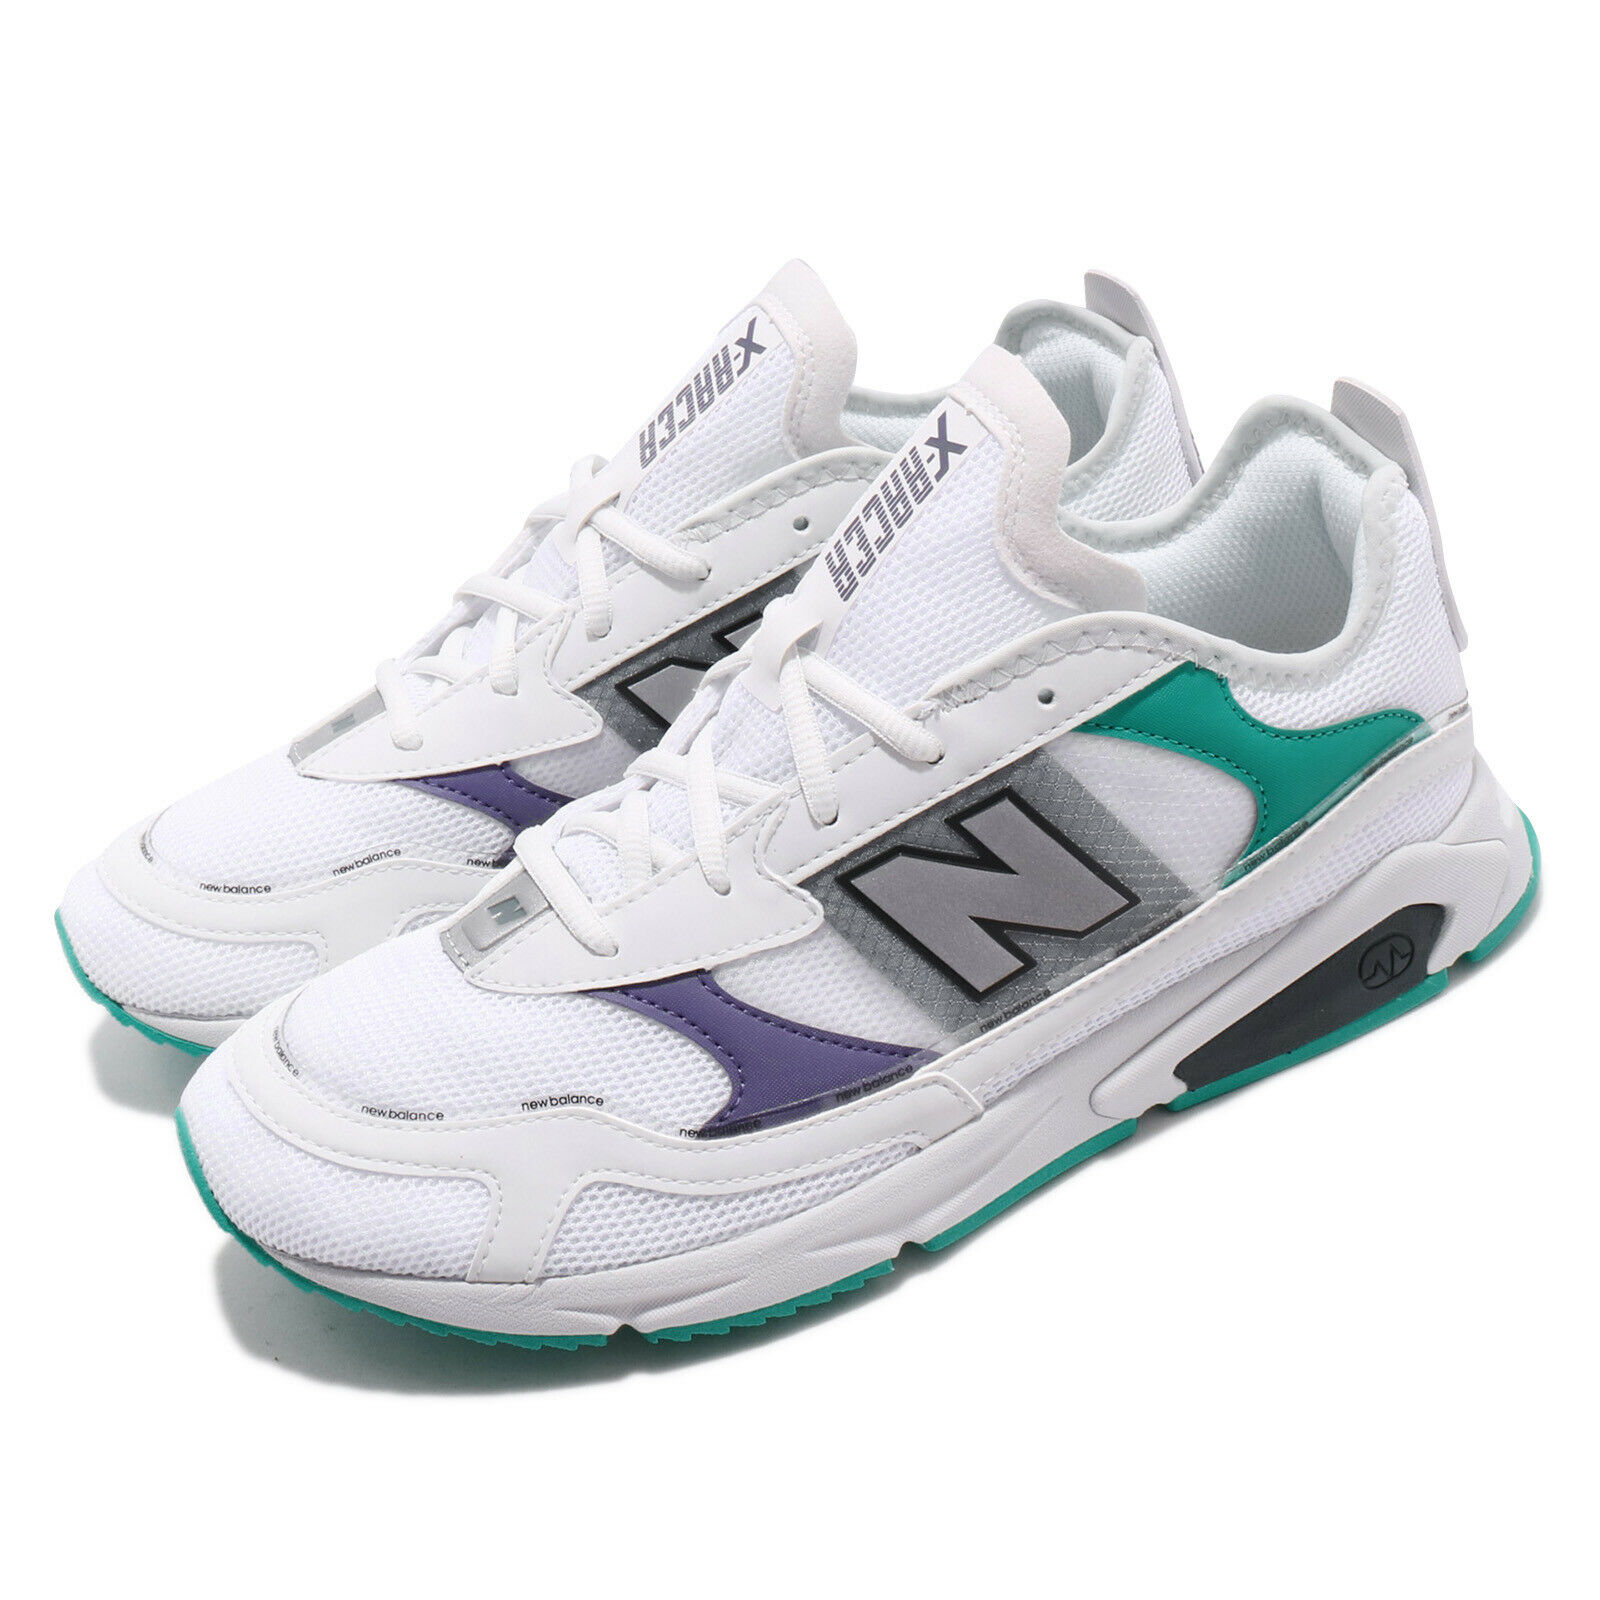 New equilibrar X Racer blanco plata verde verde verde